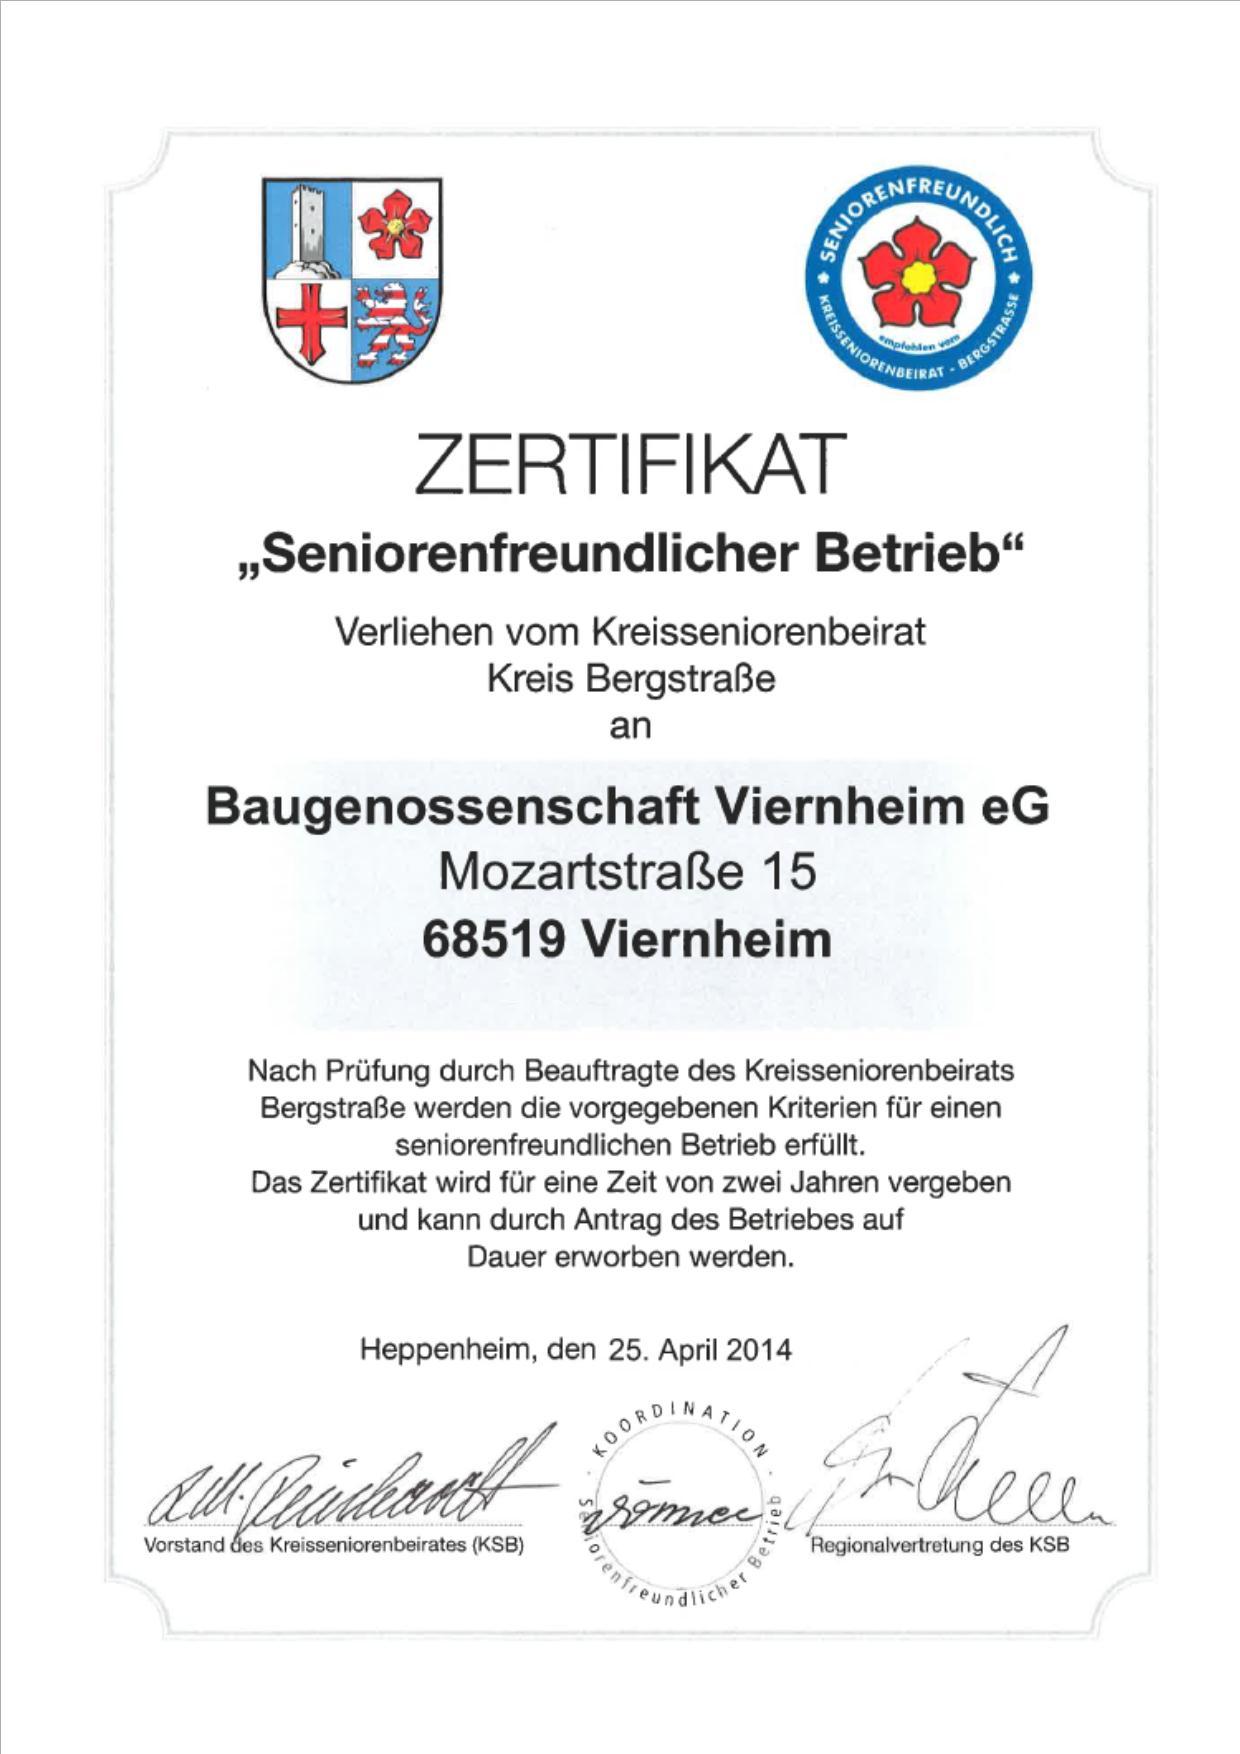 Zertifikat Kreisseniorenbeirat